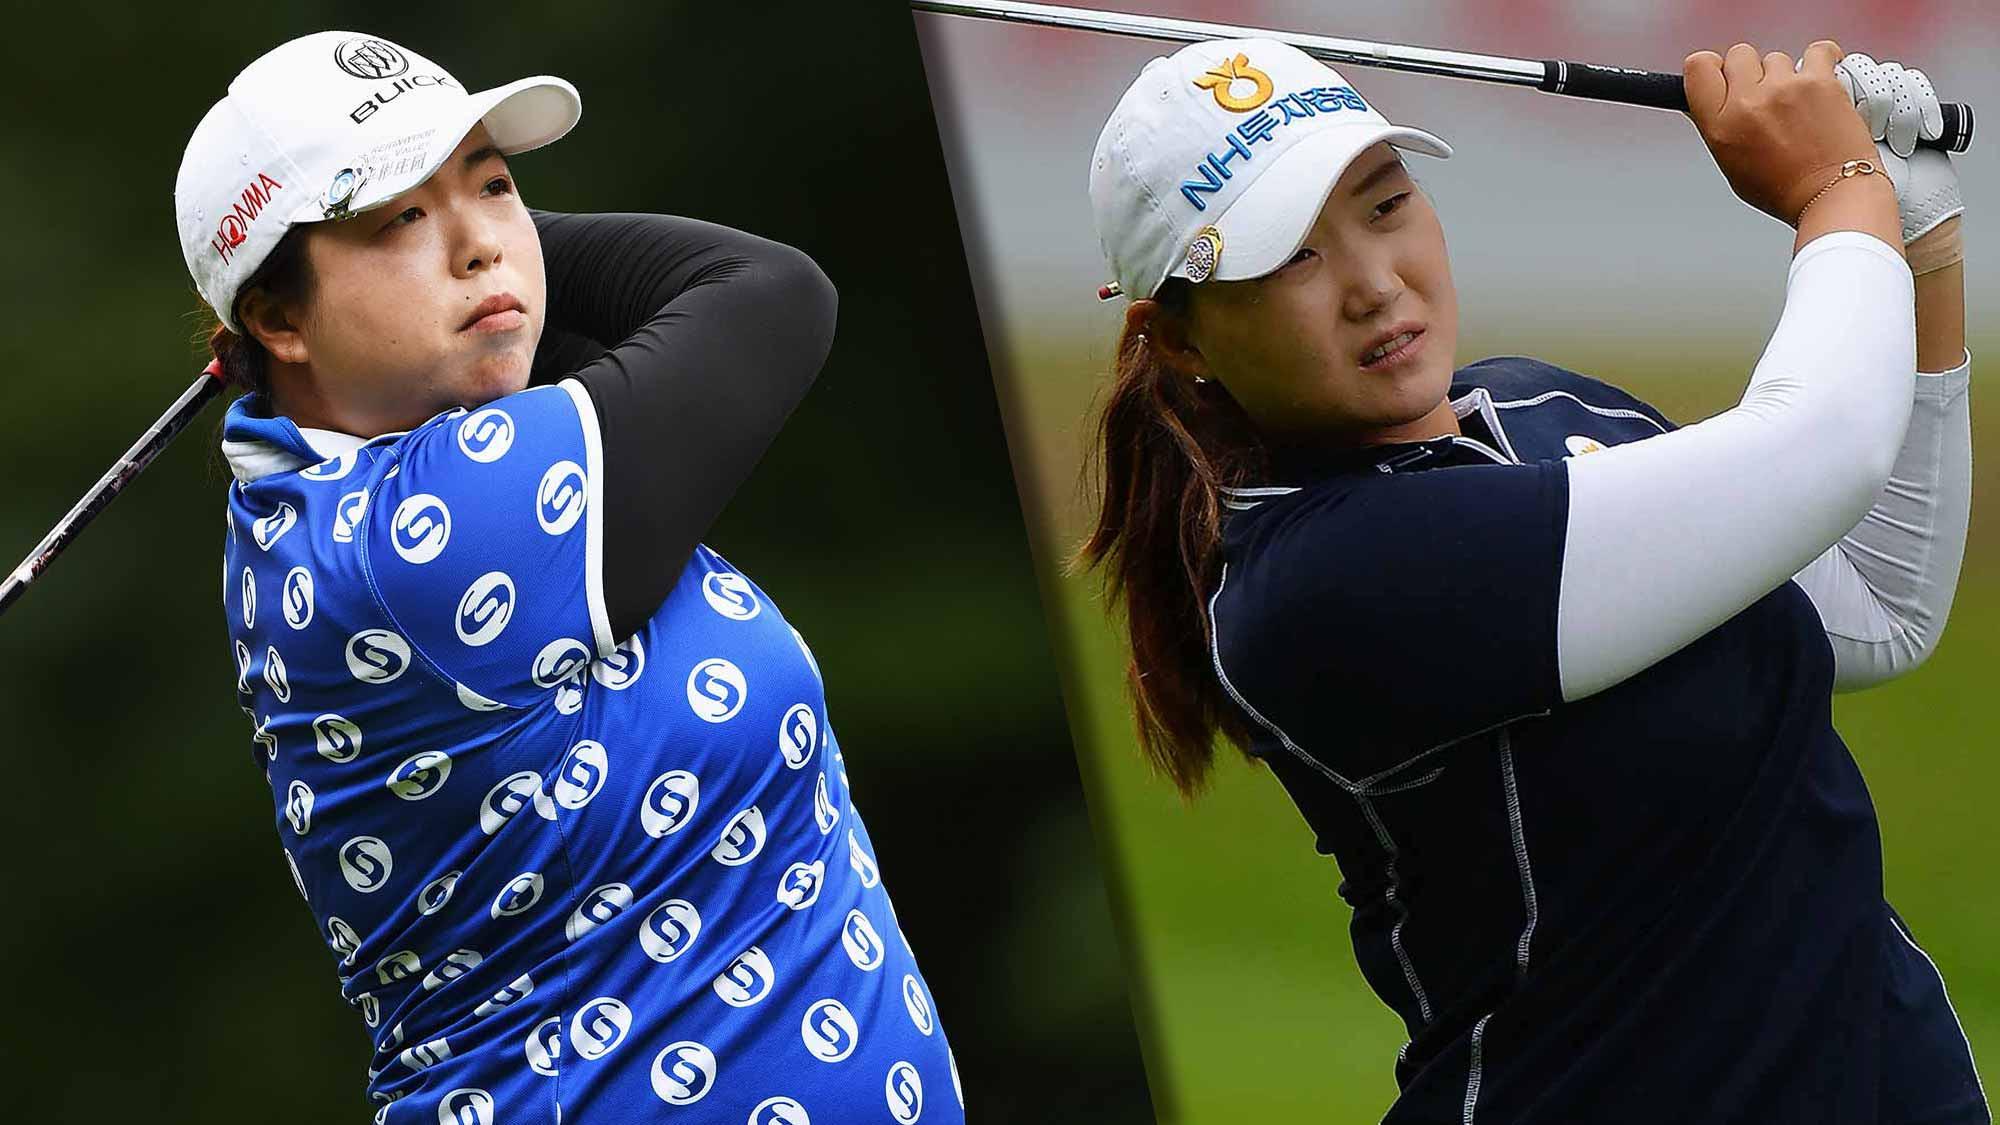 Shanshan Feng and Mirim Lee